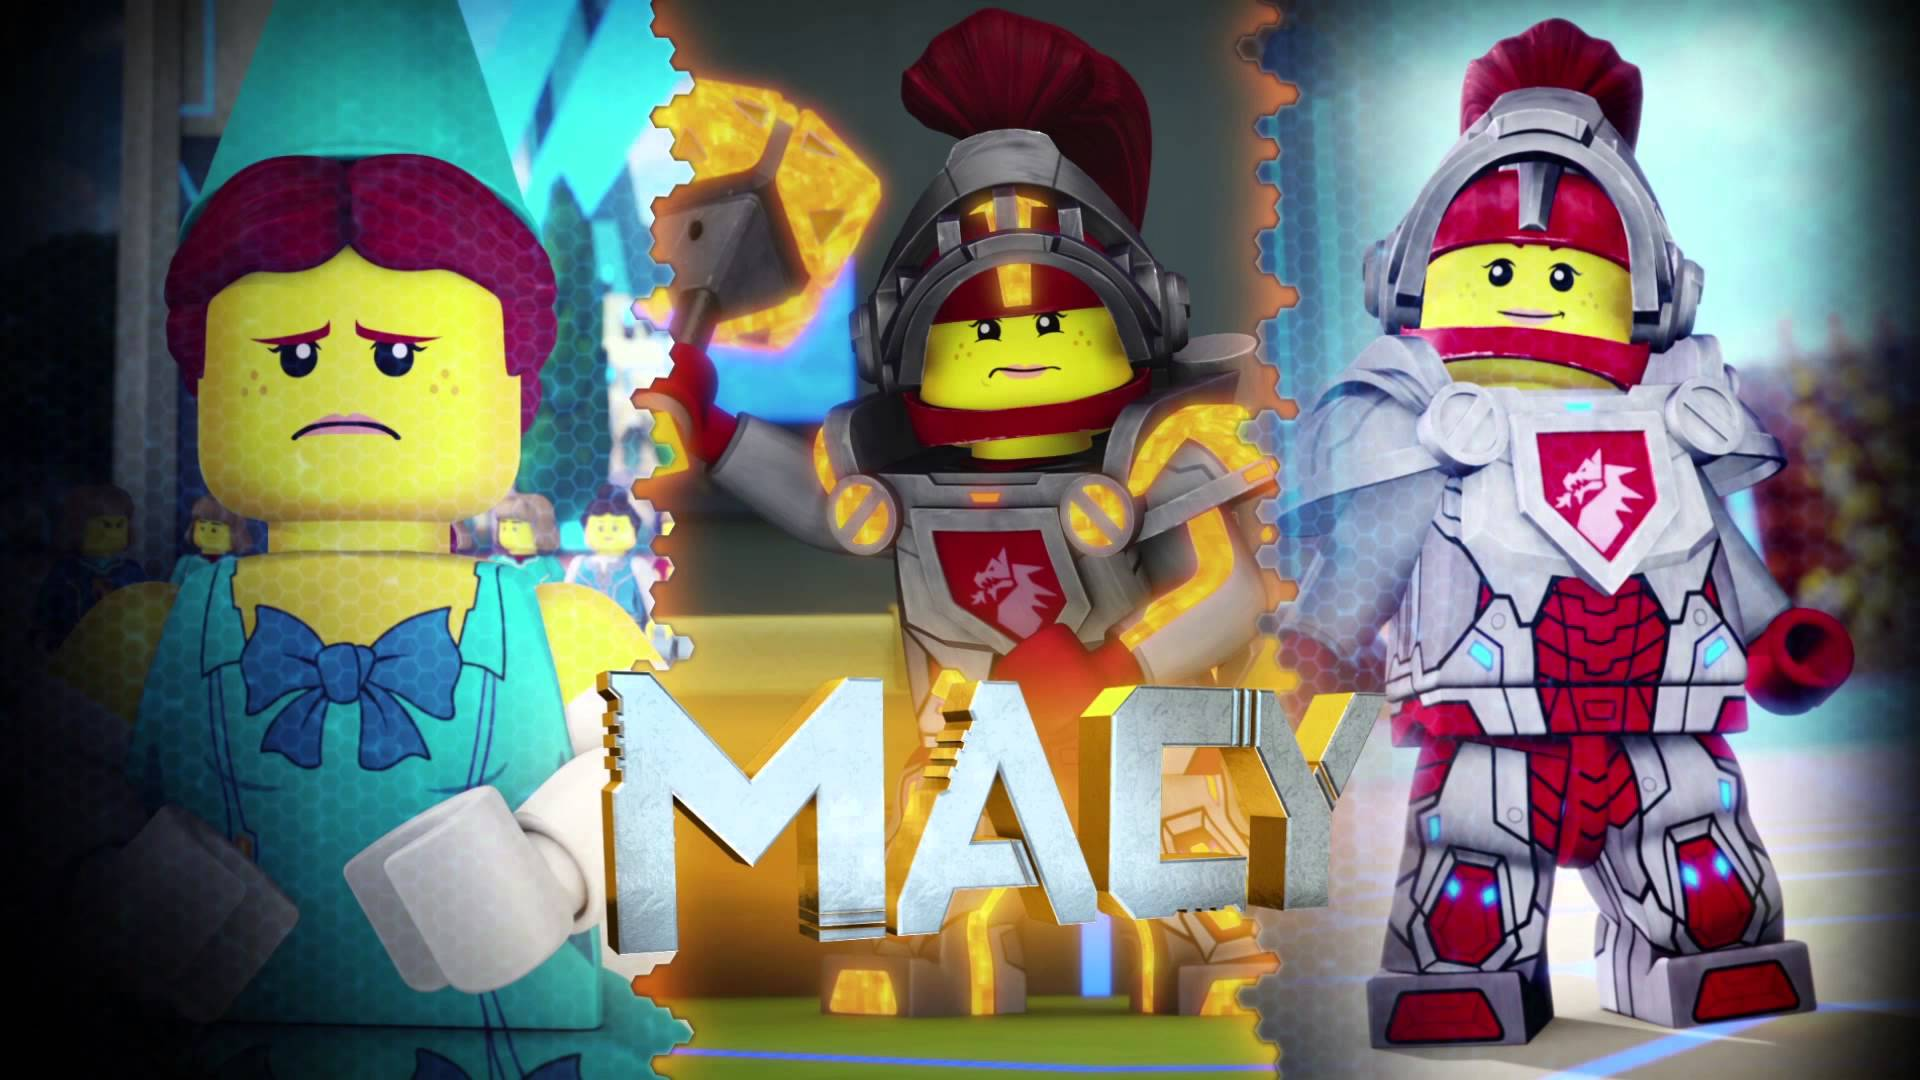 Lego nexo knights tv programm heute 2015 - 715